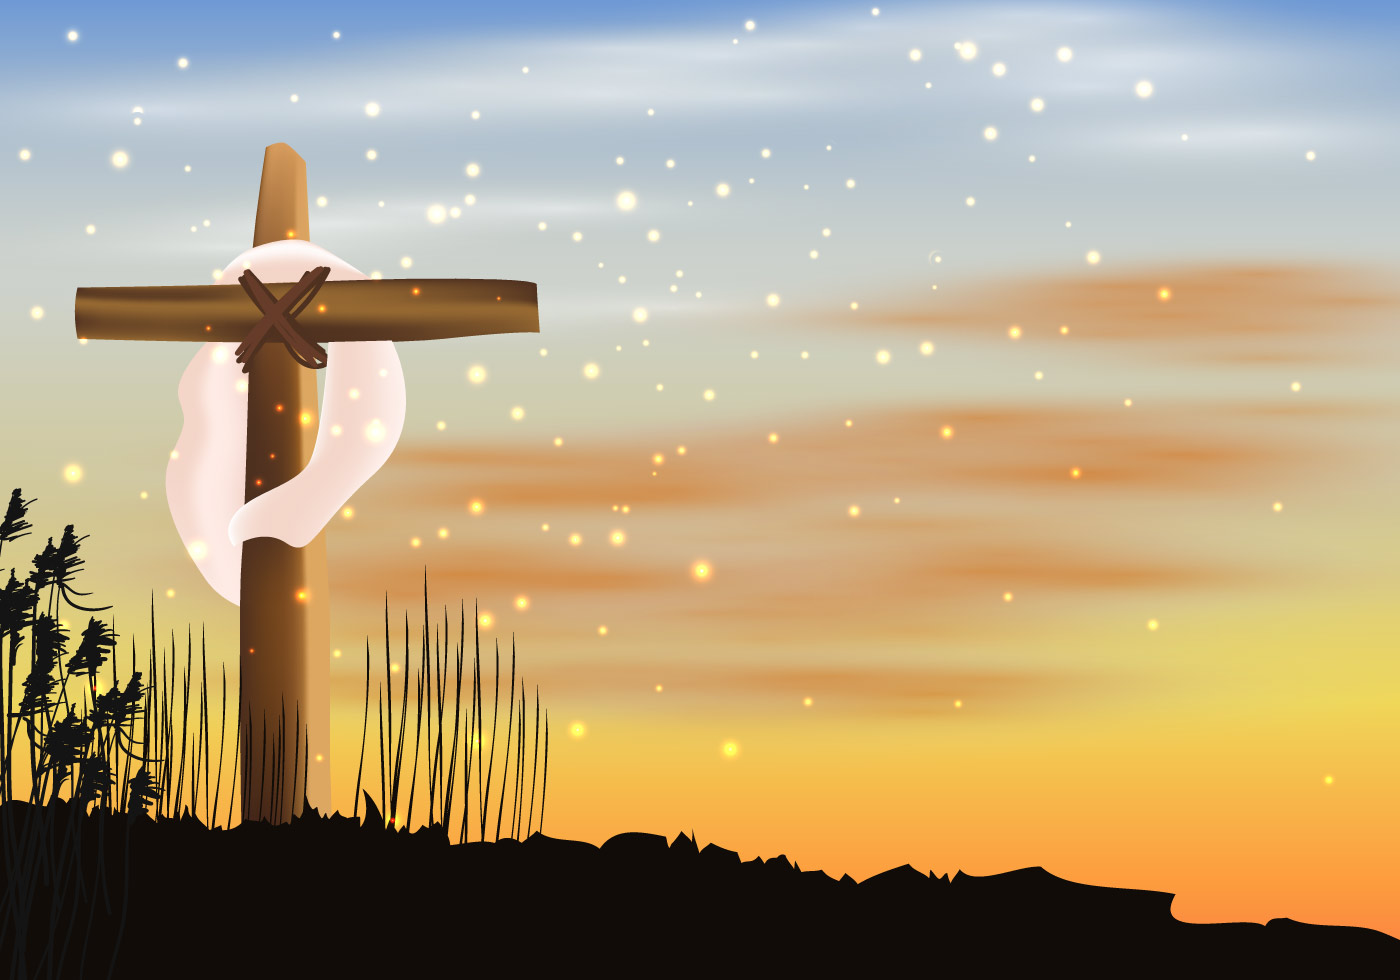 holy week Newadventorg-holy week 4catholiceducatorscom-holy week resources kencollinscom-information about holy week unplowedgroundcom-holy week reflections and prayers.